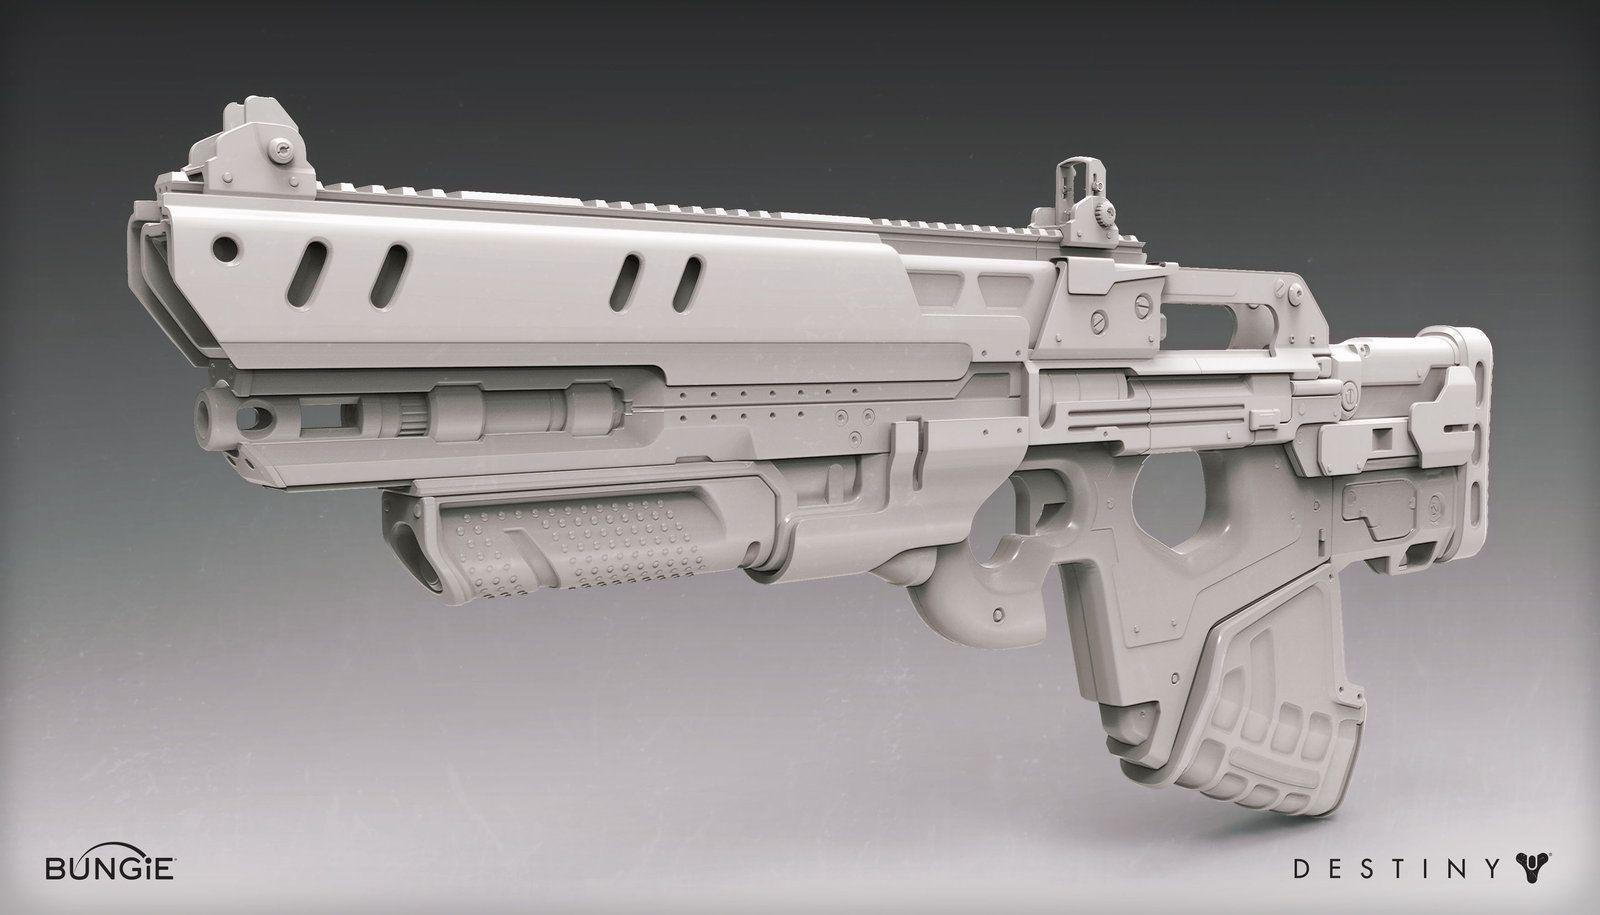 Pin by Digital3DModels.com on Mechanical/HardSurface | 武器 ...